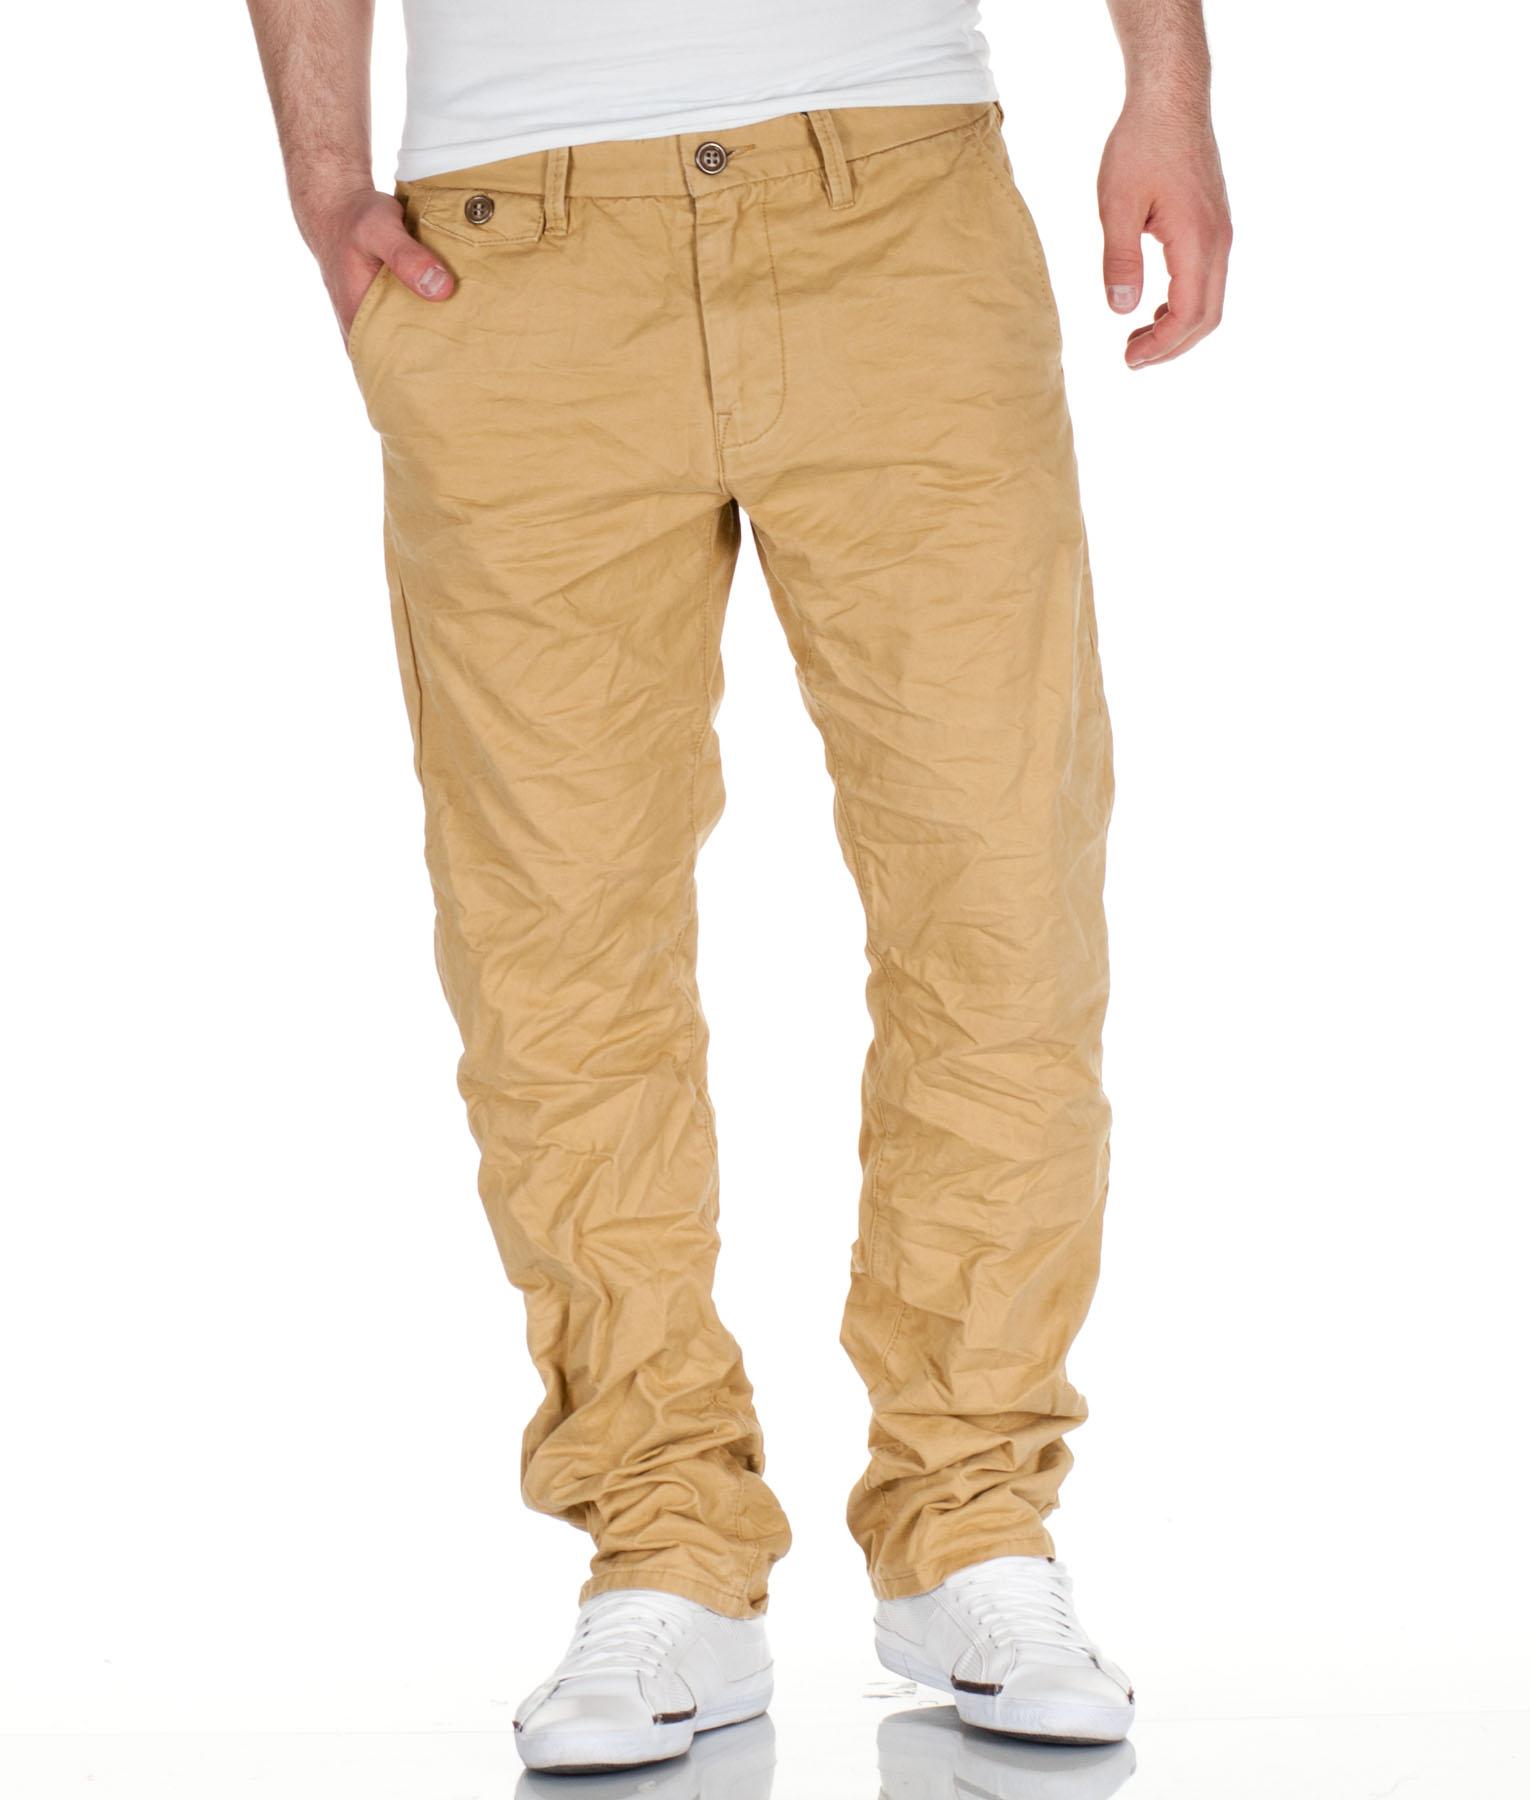 pin homme herren chino hose by bestseller jeans star mod 4500 dg ebay on pinterest. Black Bedroom Furniture Sets. Home Design Ideas